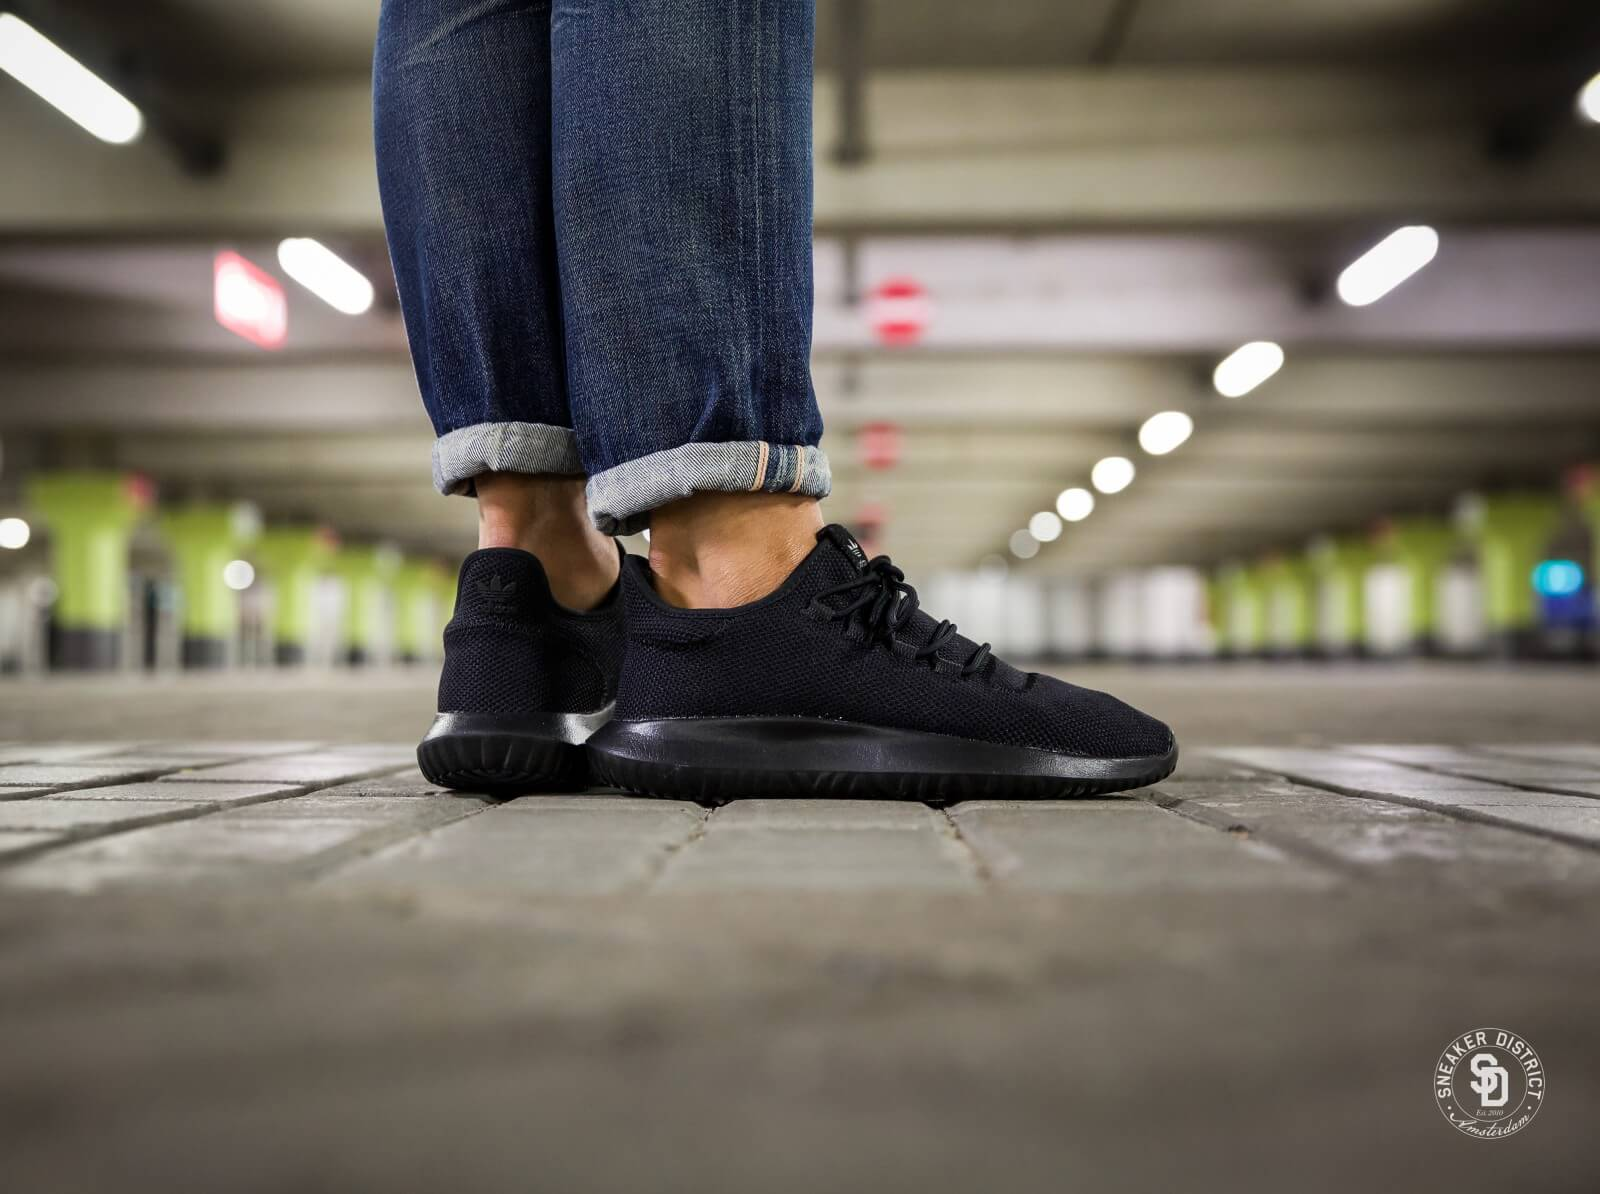 Adidas Tubular Shadow Core Black/Footwear White/Core Black